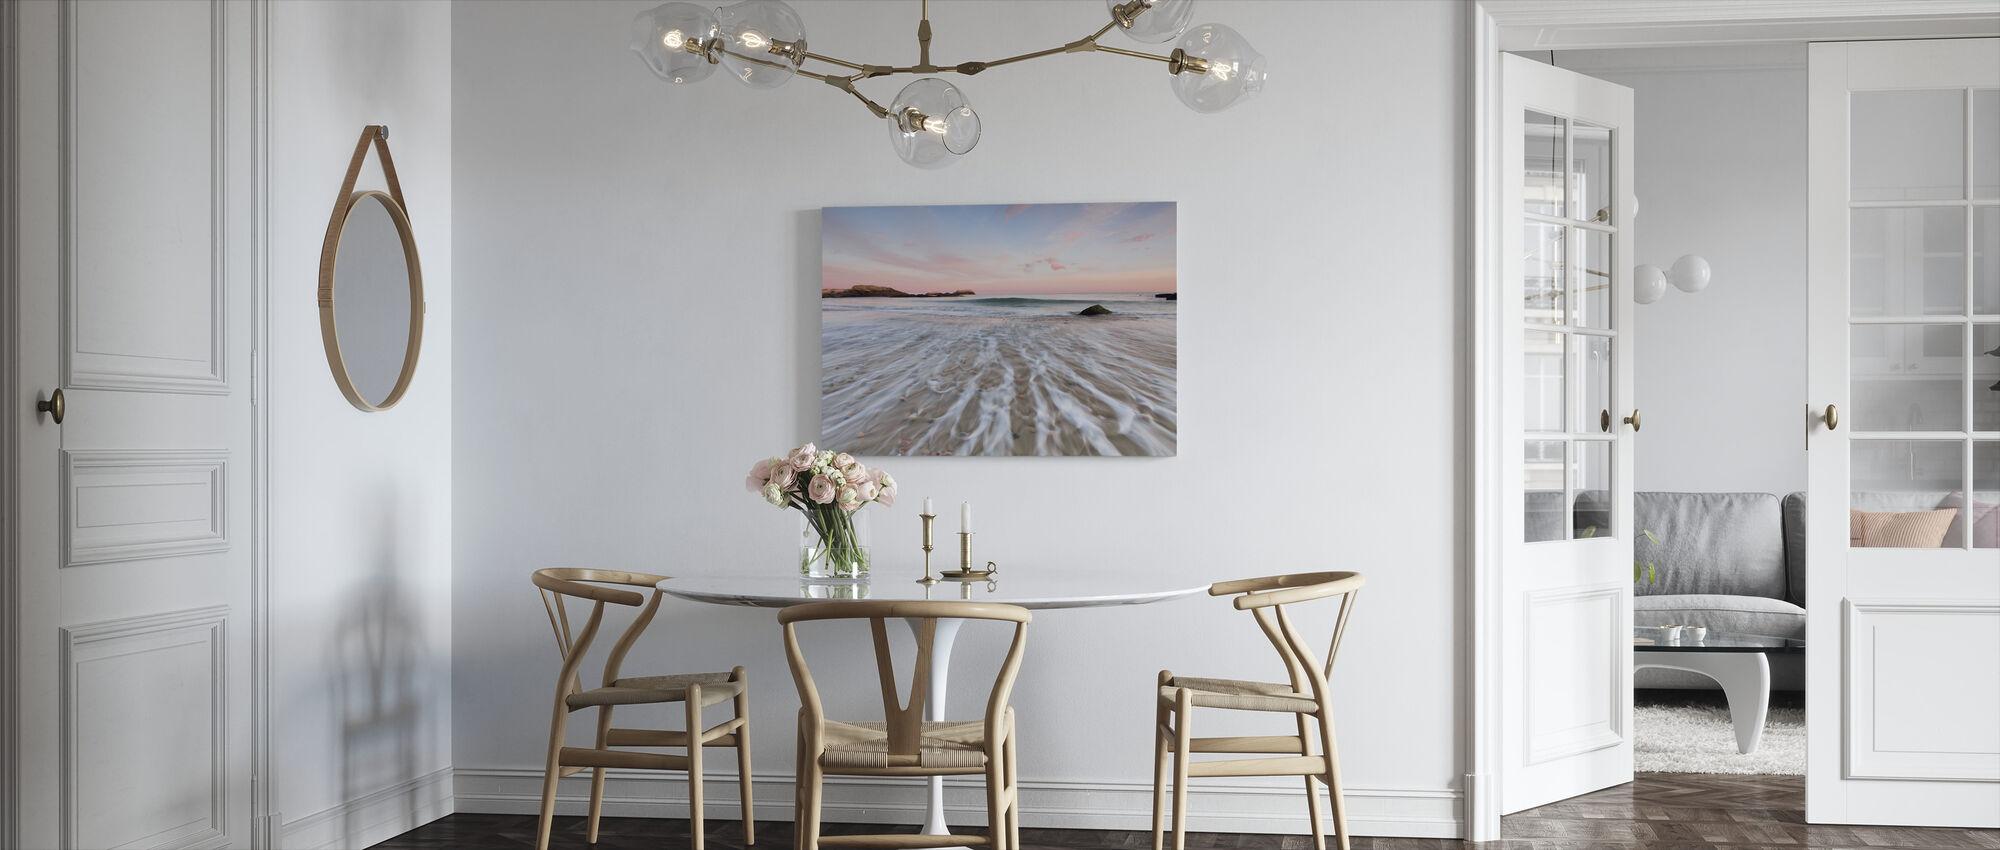 Drijfhout Zonsondergang - Canvas print - Keuken